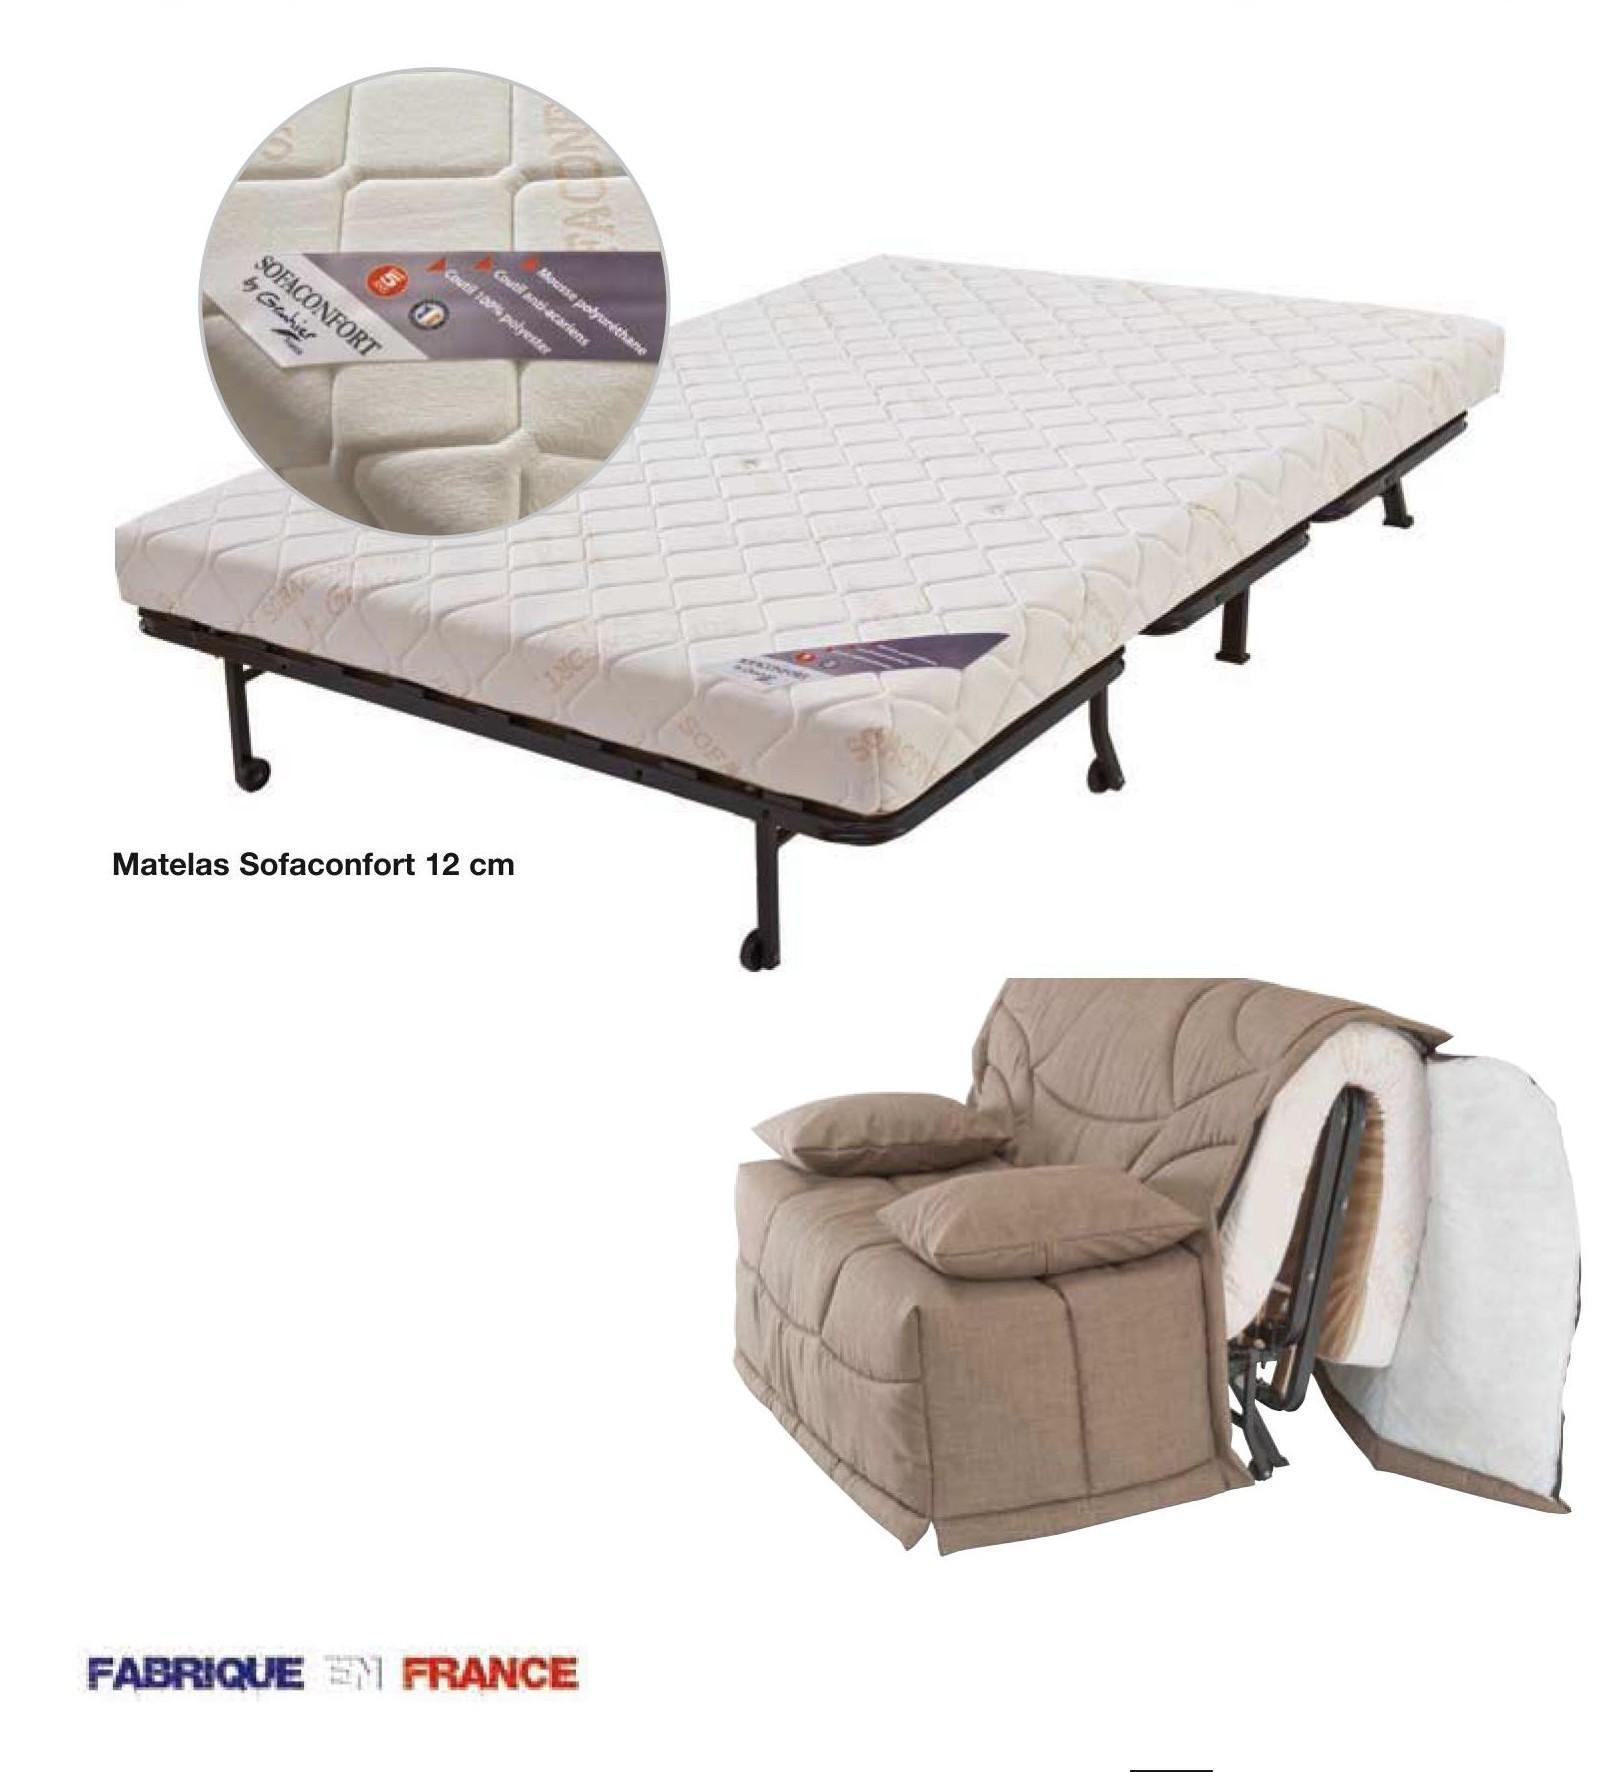 acheter tulsi sleep pas cher online and mail order pharmacies. Black Bedroom Furniture Sets. Home Design Ideas